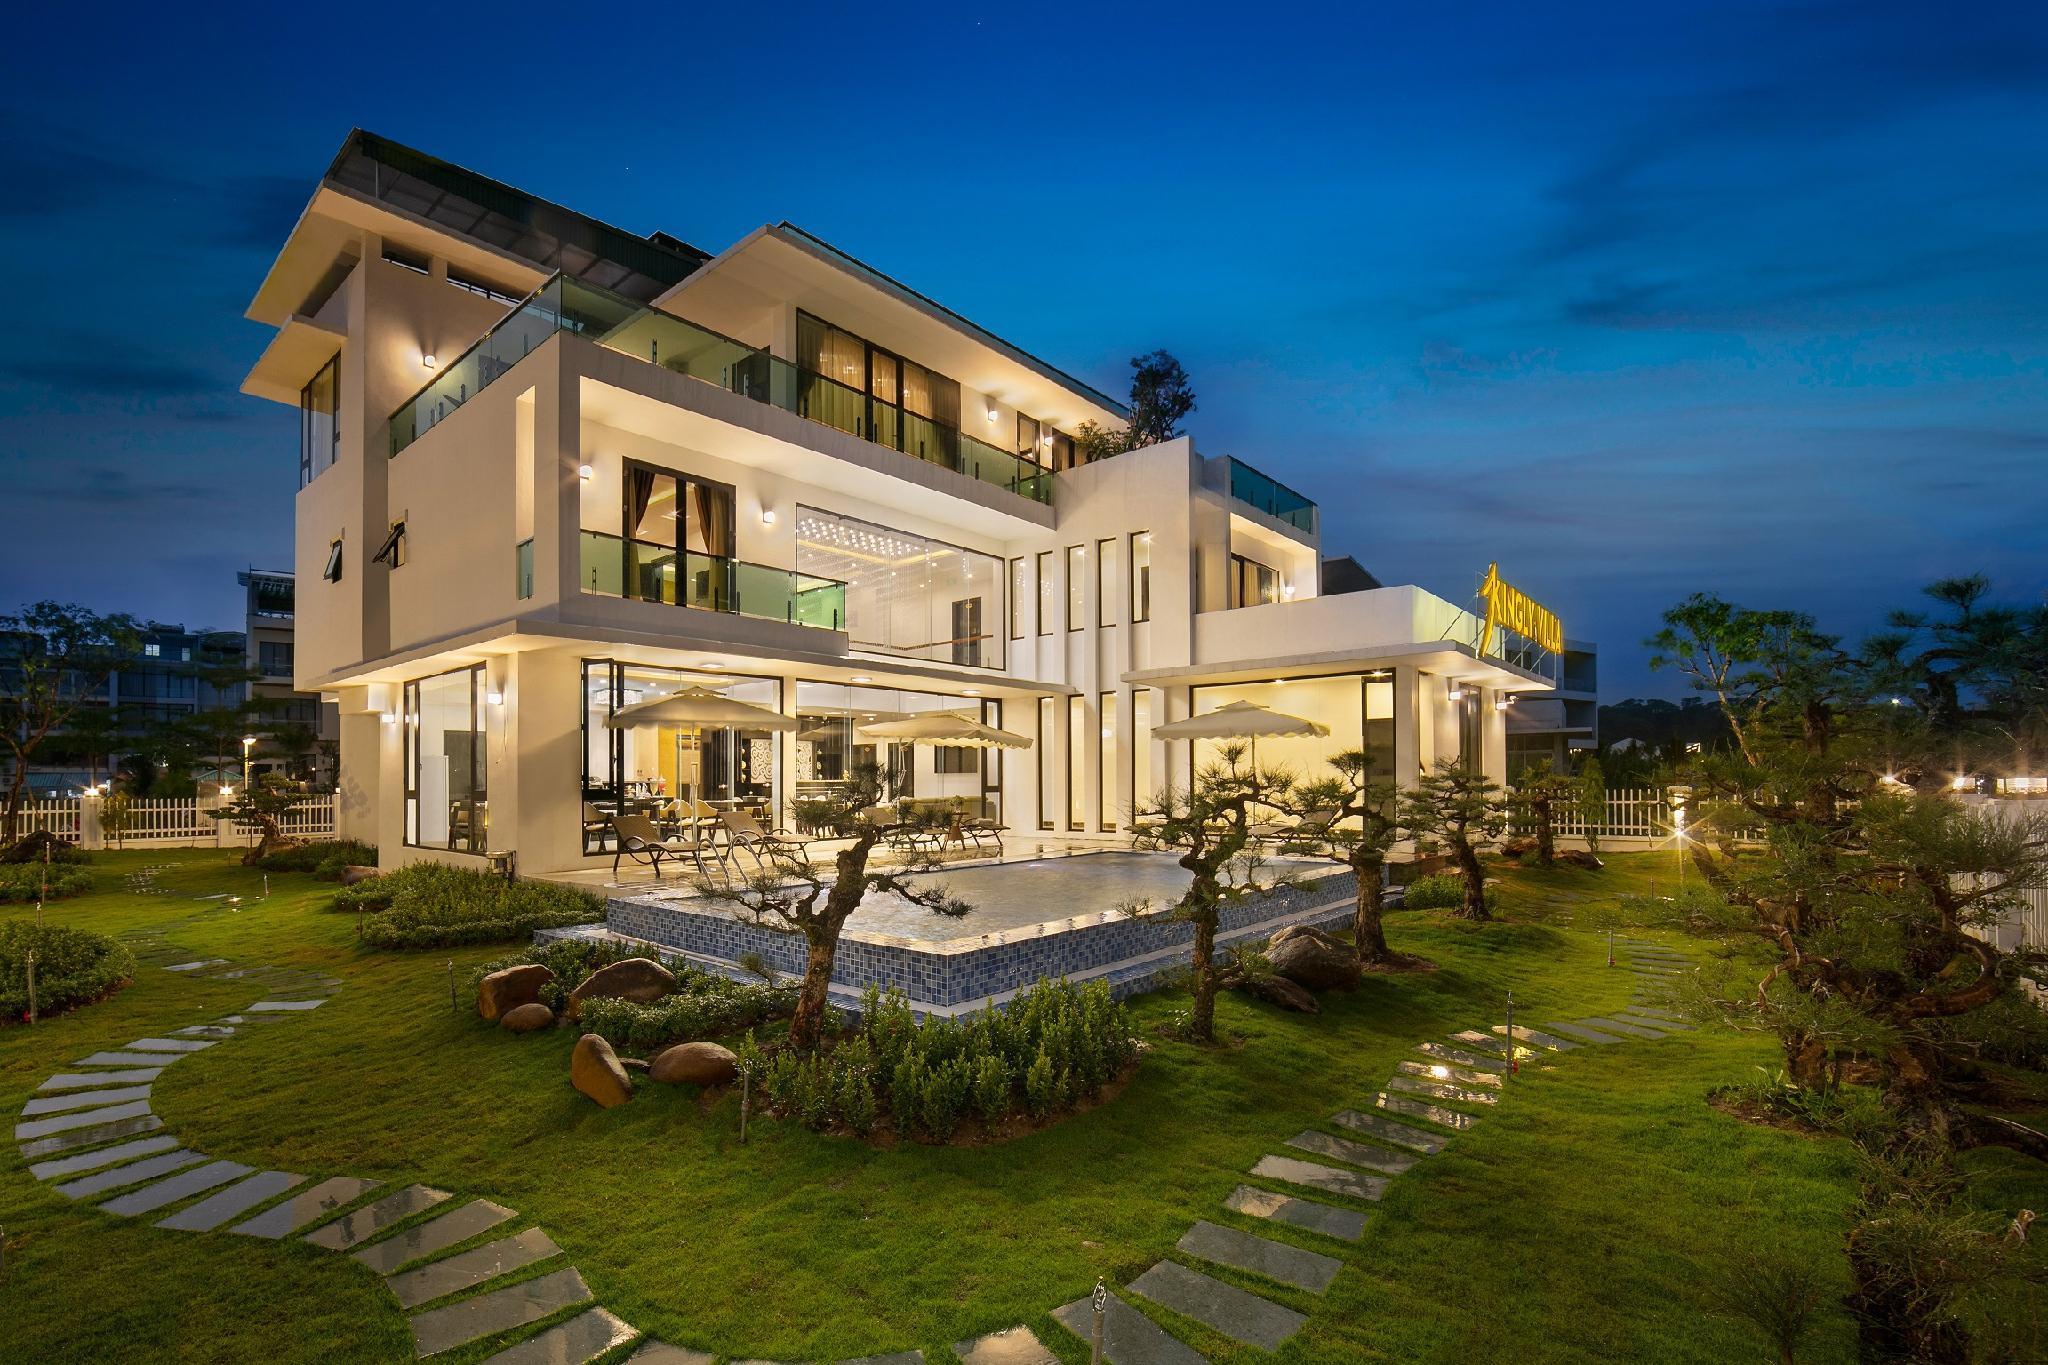 Tuan Chau Kingly Villa